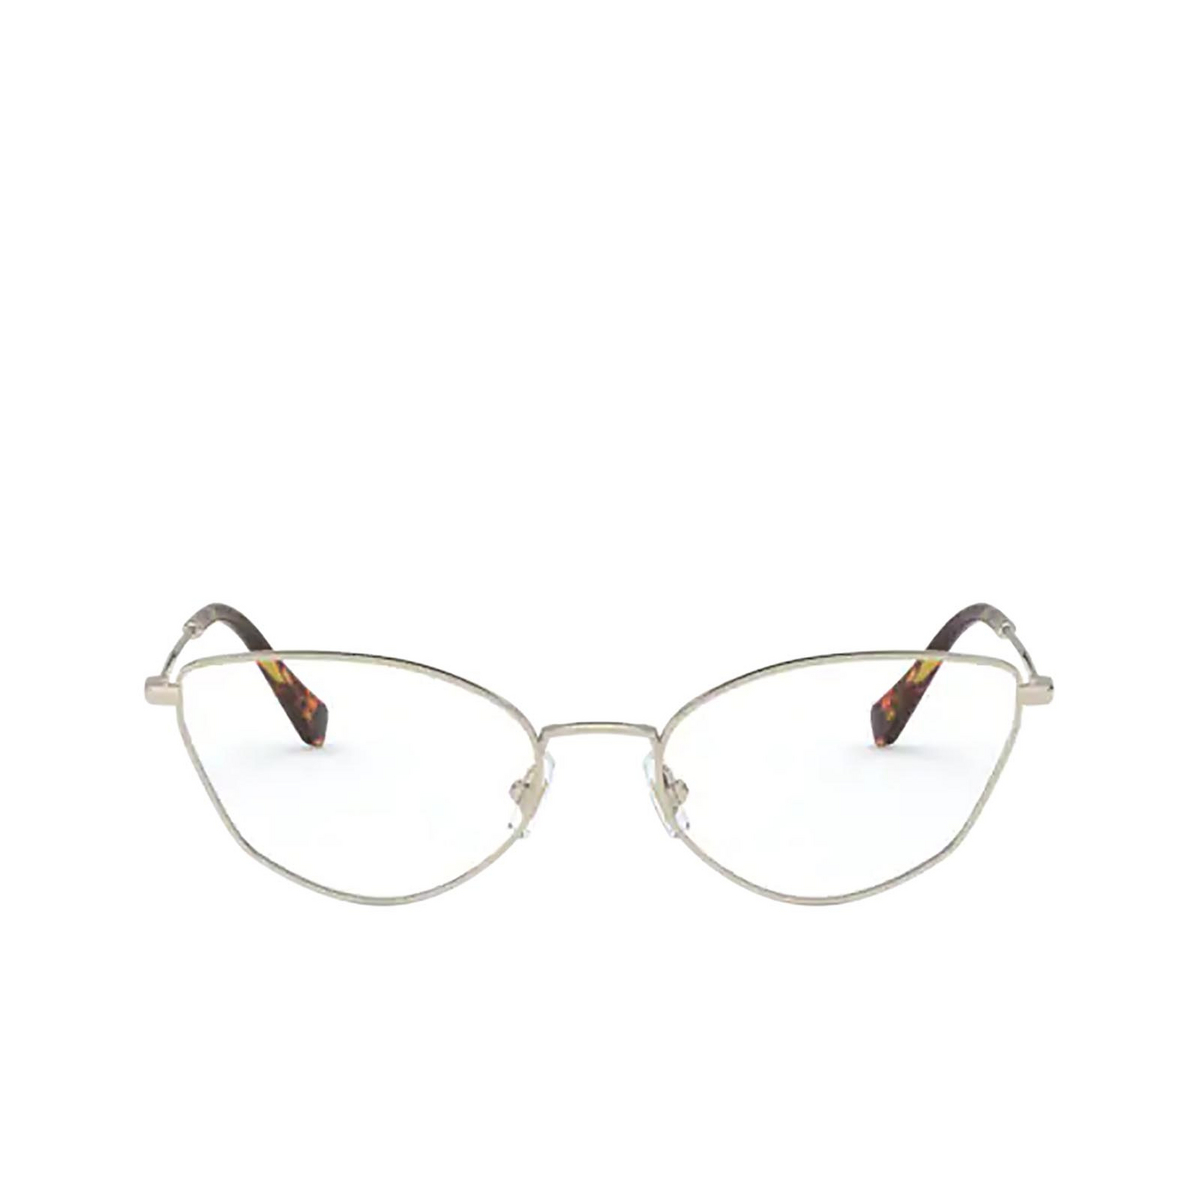 Miu Miu® Cat-eye Eyeglasses: MU 51SV color Pale Gold ZVN1O1 - front view.